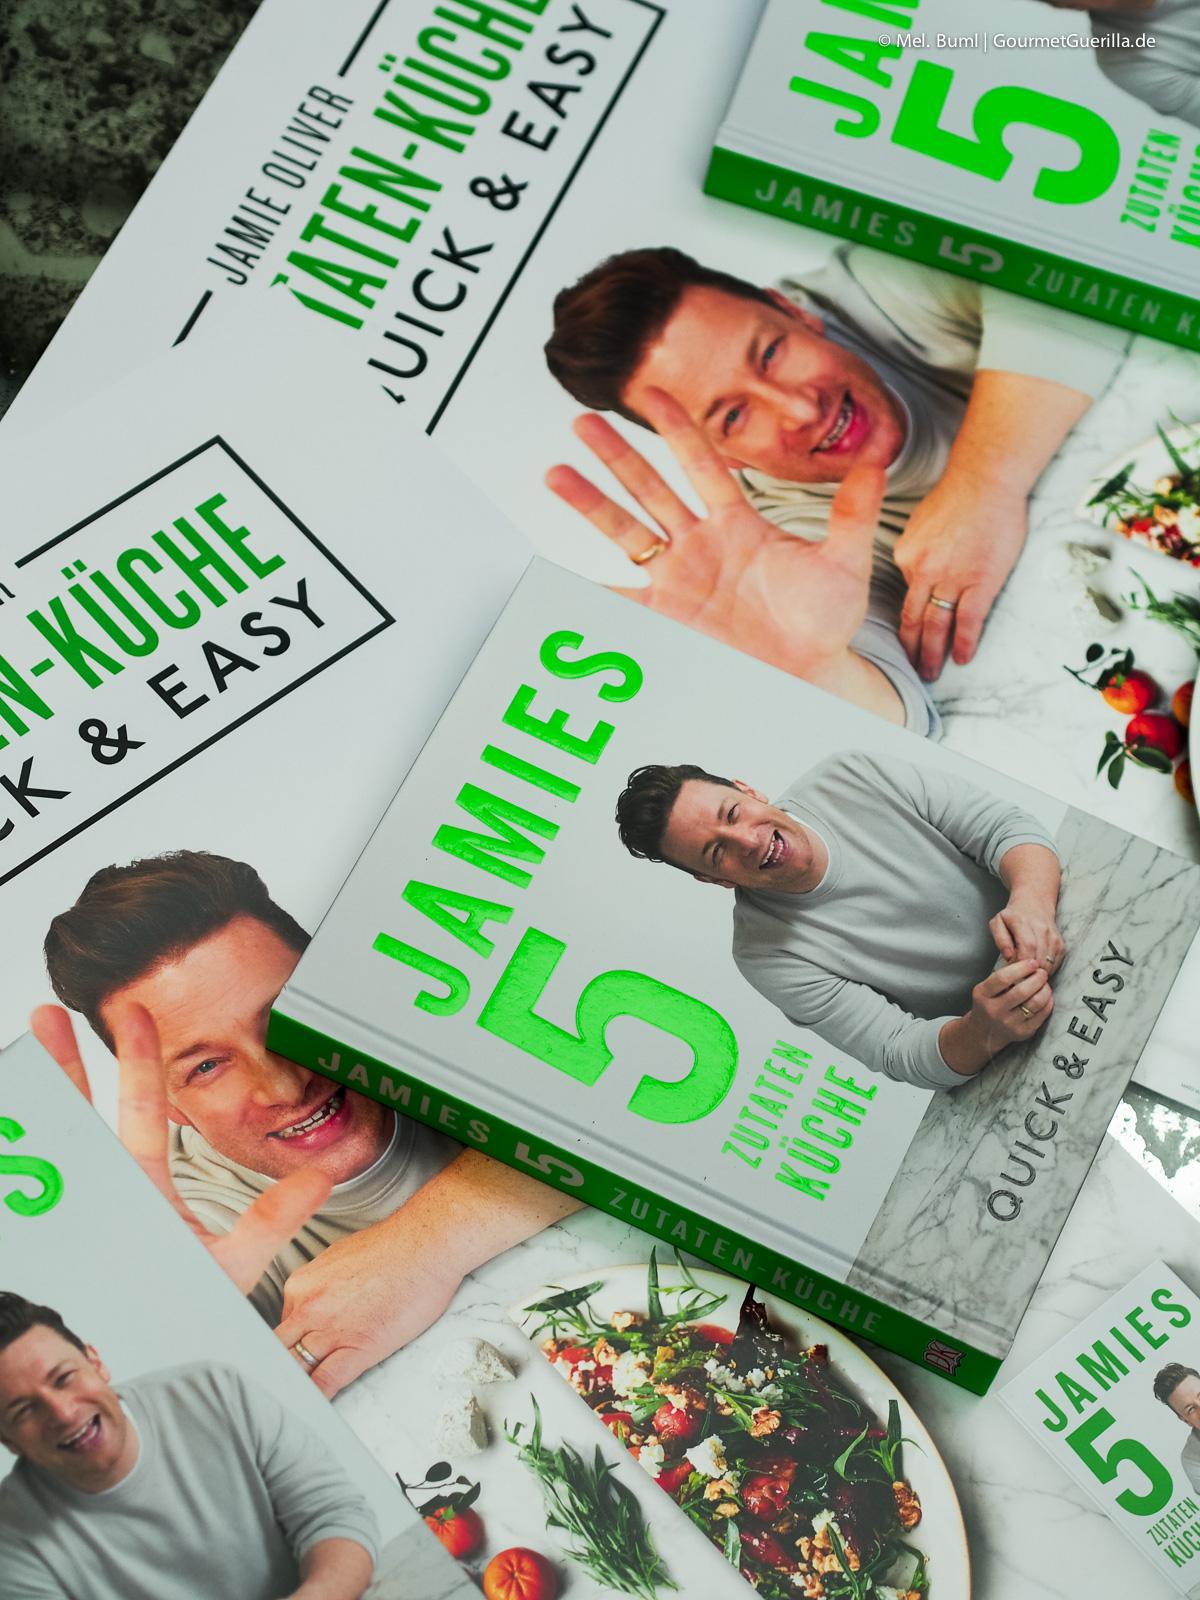 Kochbuch Jamies 5 Zutaten Küche GourmetGuerilla meets Jamie Oliver |GourmetGuerilla.de